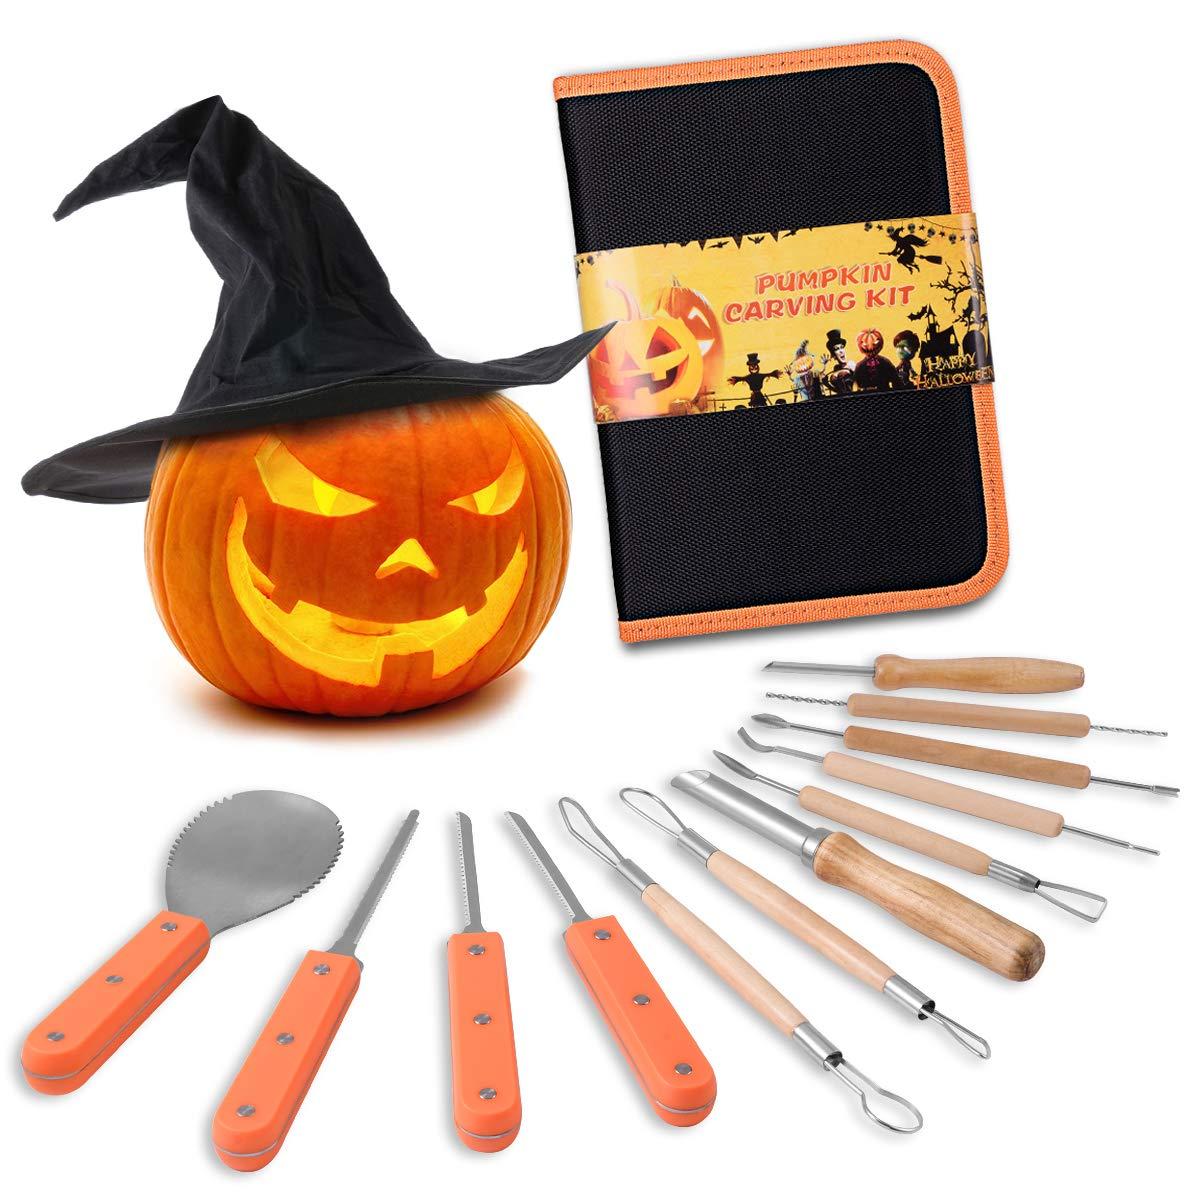 Snowcinda Pumpkin Carving Kit, Includes 12 Pcs Stainless Steel As a Carving Set for Pumpkin Halloween Decoration Easily Sculpting Jack-O-Lanter Halloween Set by SnowCinda